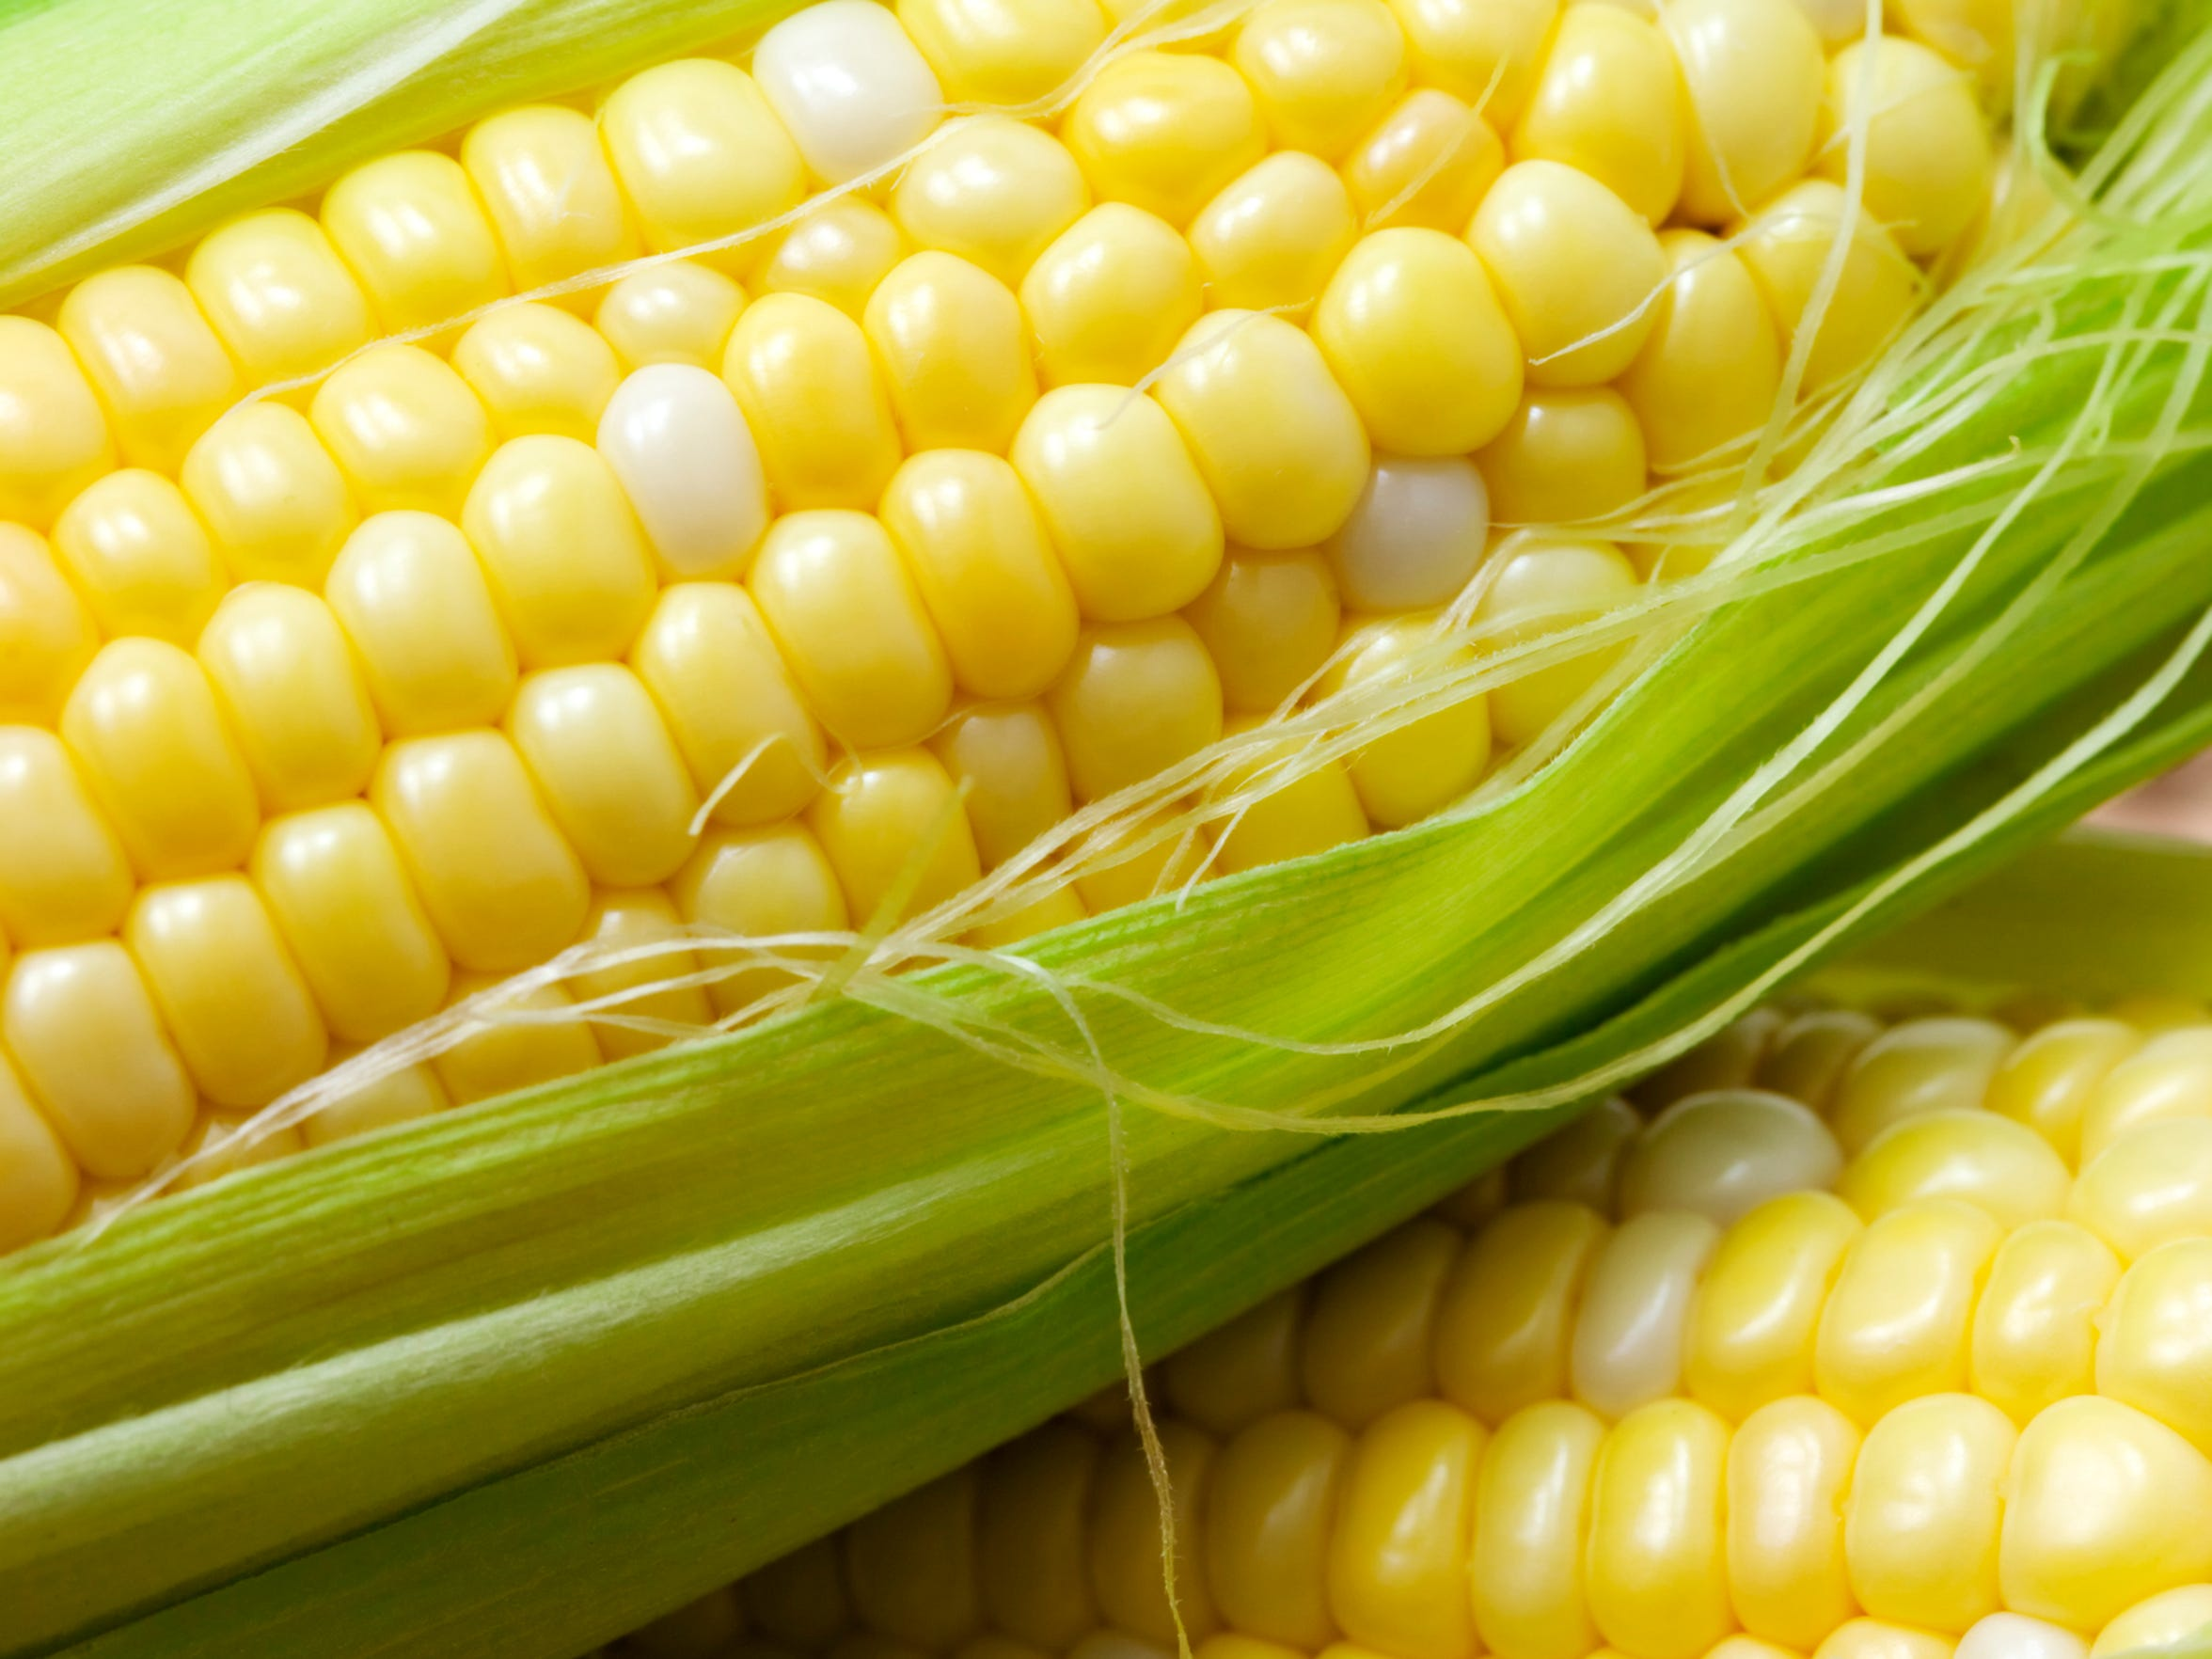 One ear of corn has approximately 800 kernels in 16